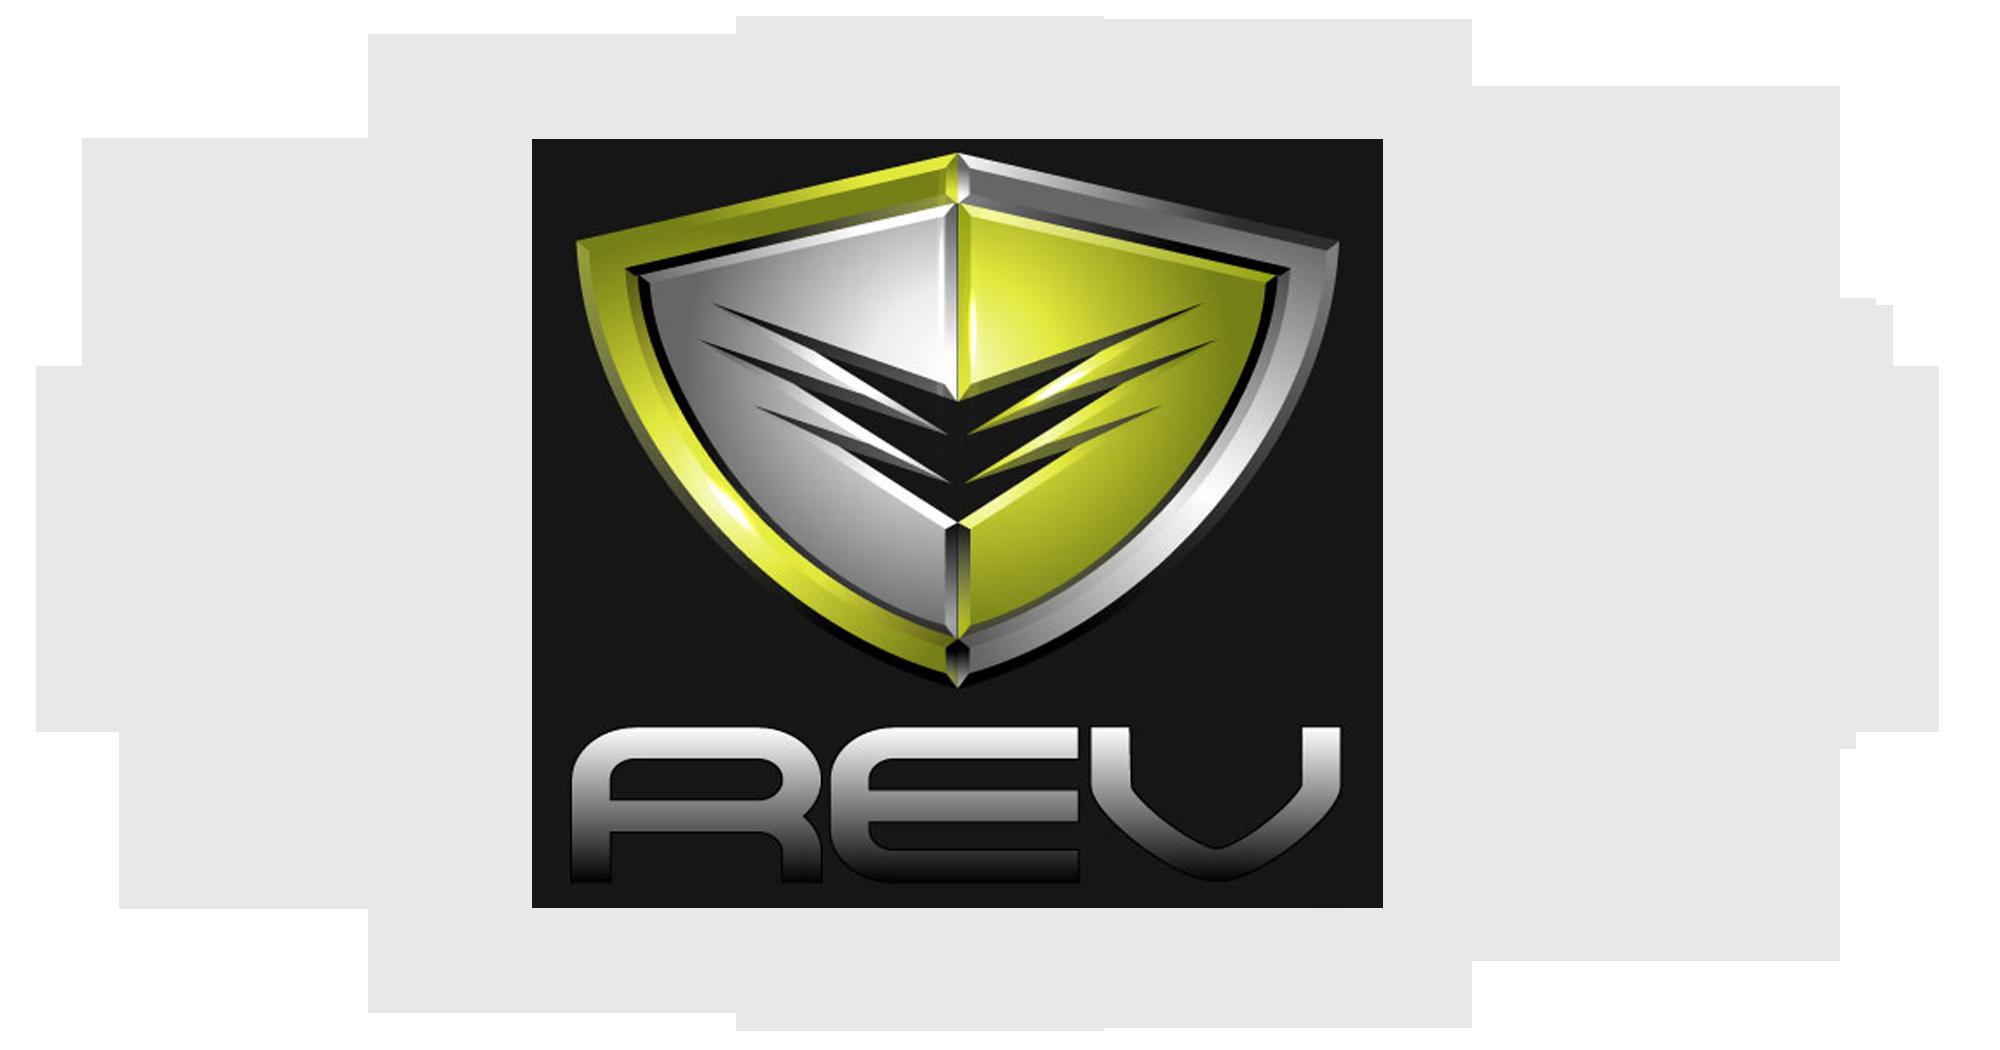 REV Rapid Electric Vehicle